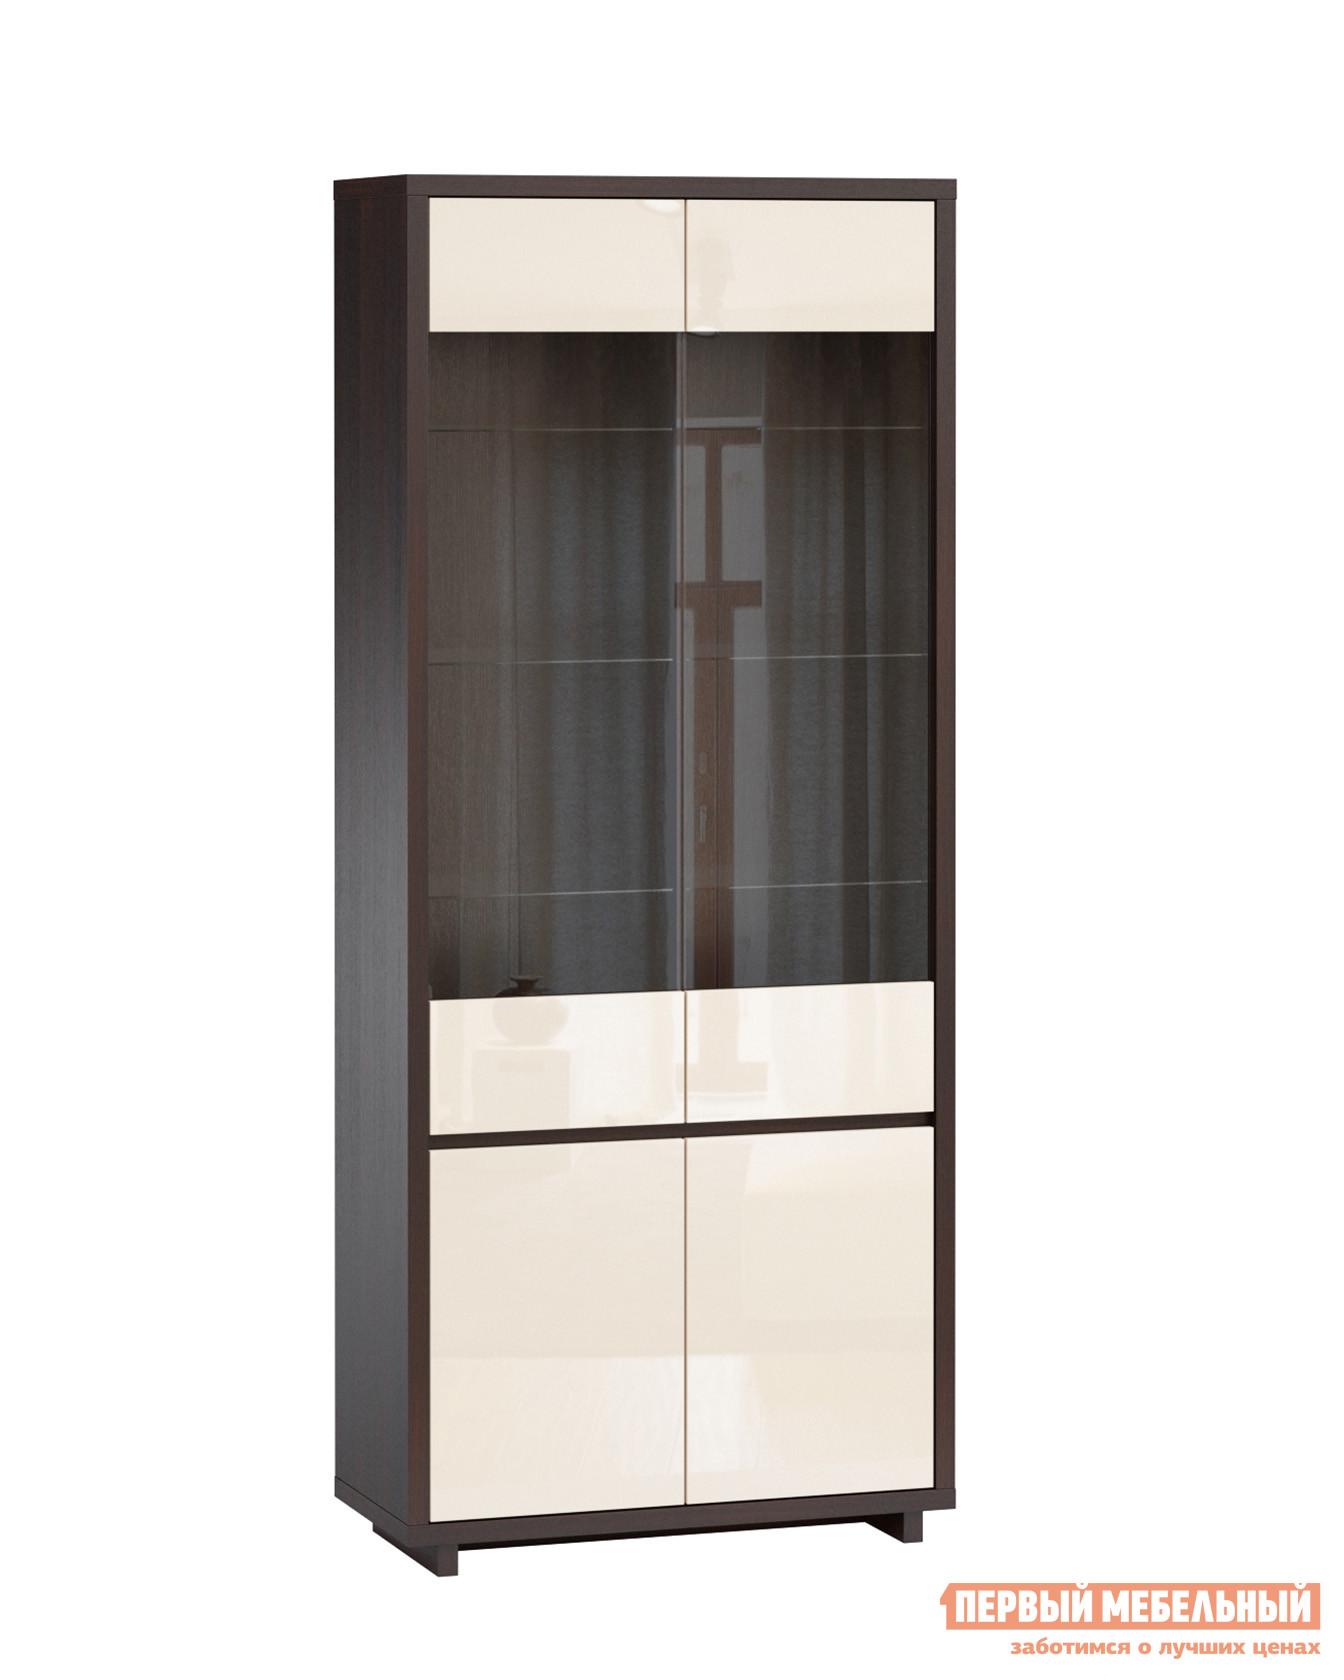 Шкаф-витрина WOODCRAFT Аспен Шкаф-витрина (4 двери) шкаф распашной woodcraft эссен шкаф 1 дверь